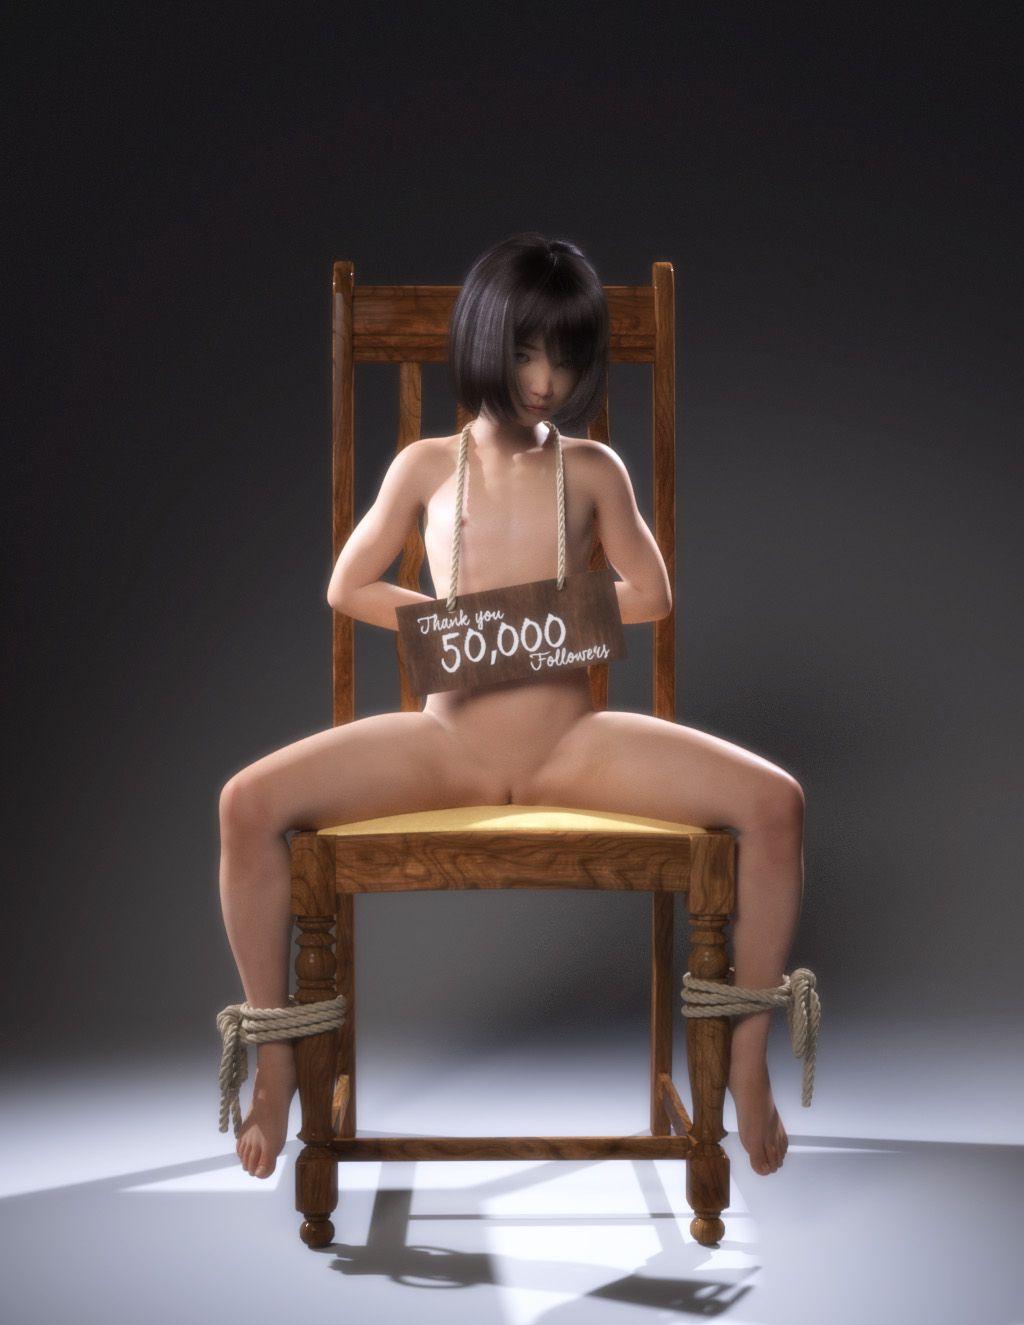 loli completely_nude1590